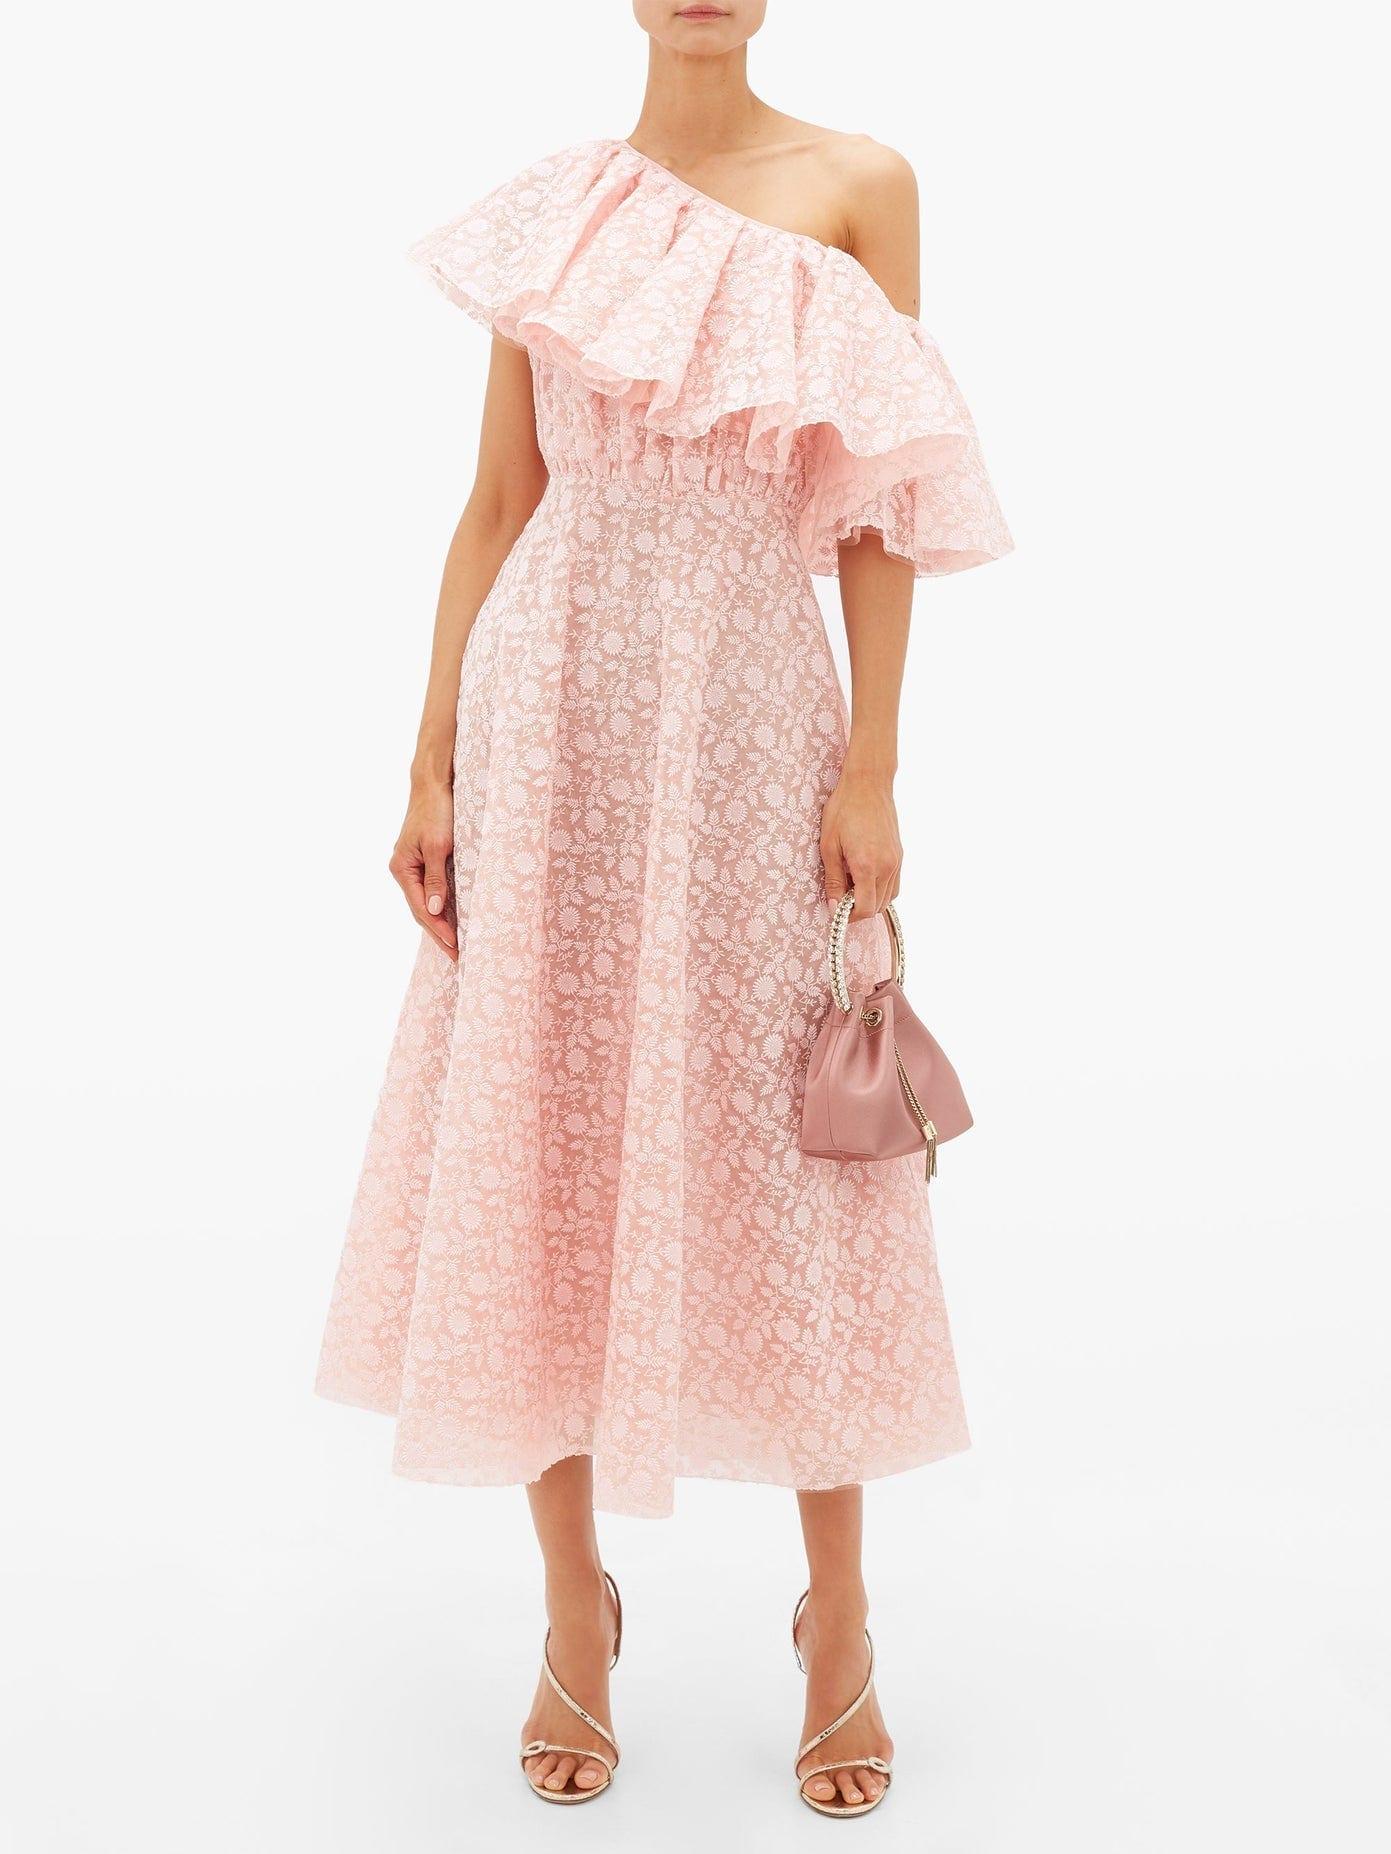 GIAMBATTISTA VALLI Sunflower-lace Ruffled One-shoulder Dress